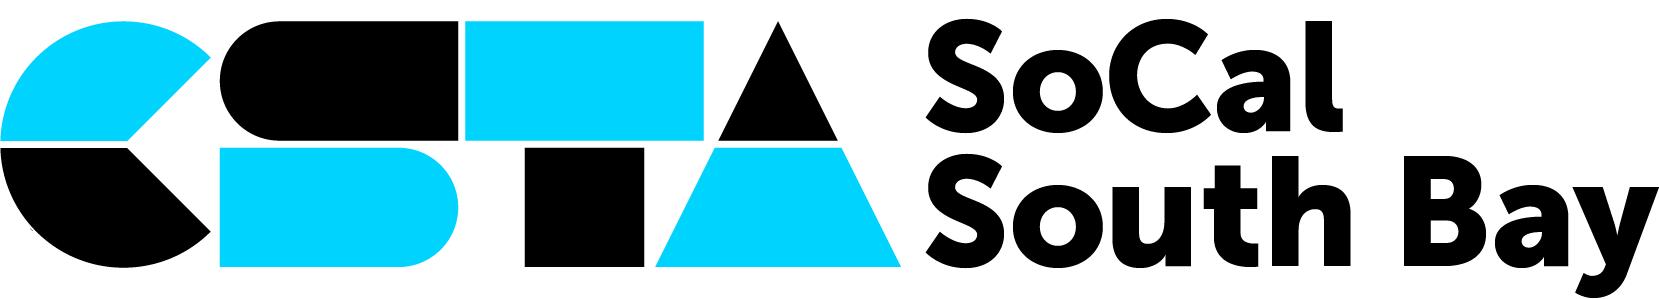 CSTA SoCal South Bay logo